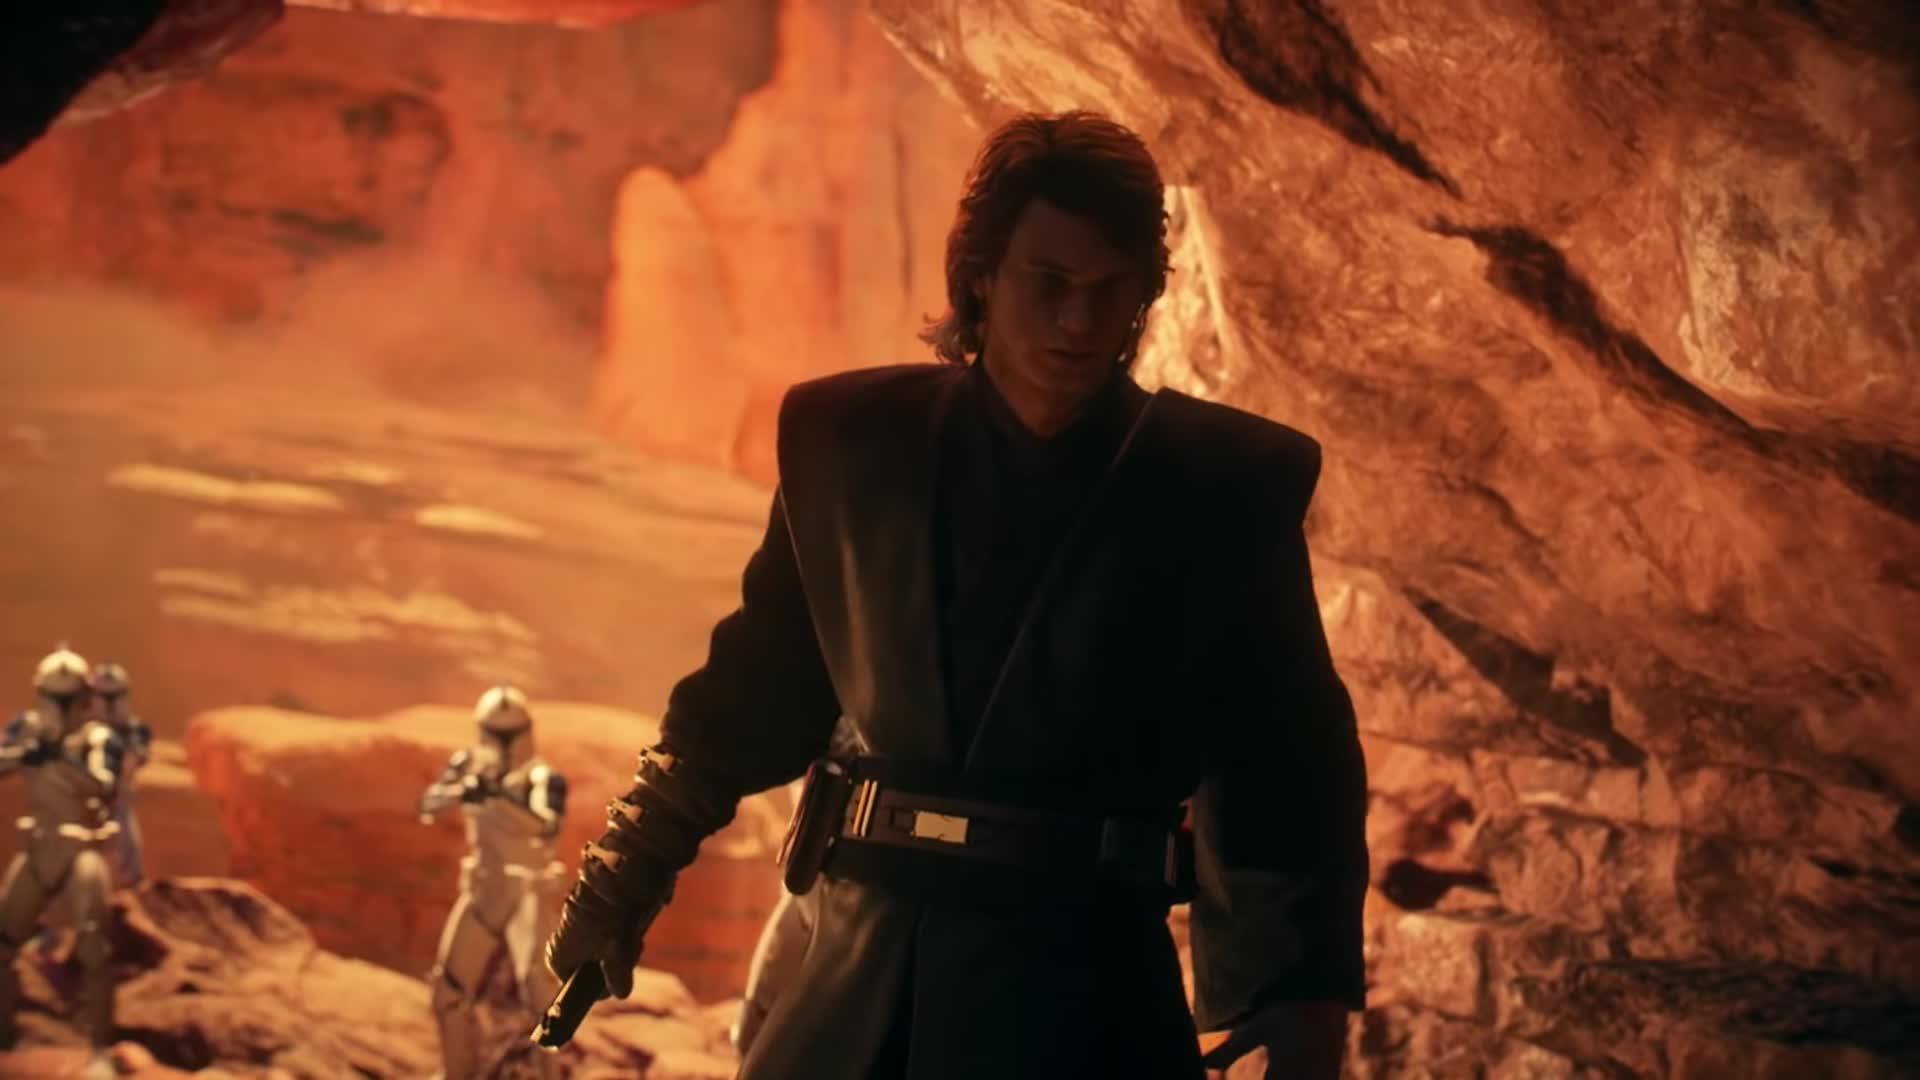 Star Wars Anakin Skywalker Wallpaper Posted By Samantha Peltier